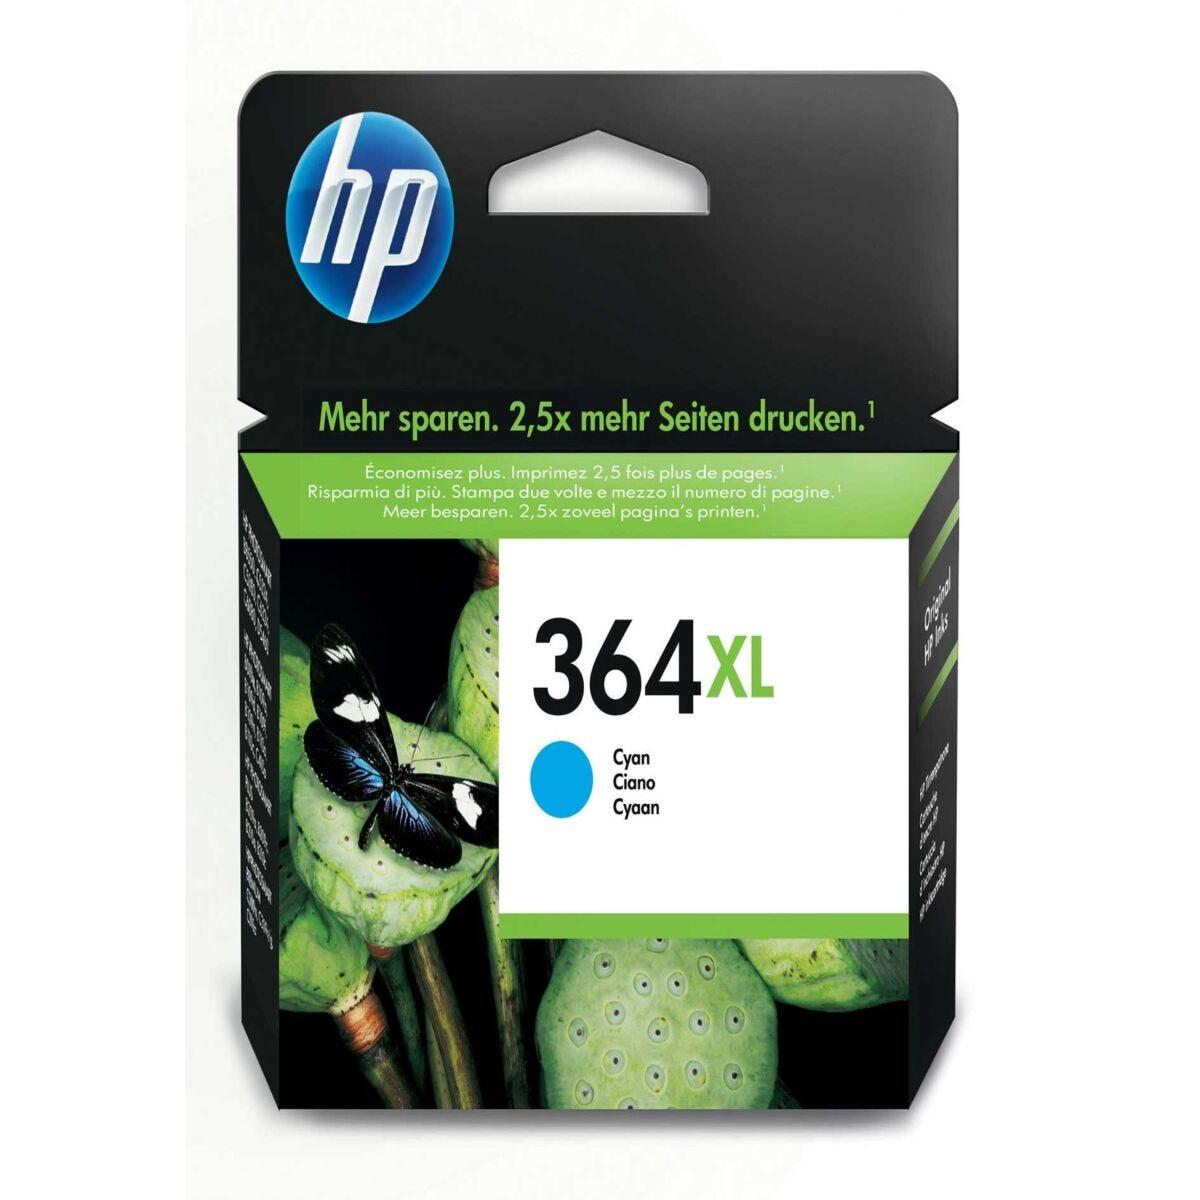 HP 364XL Inkjet Cartridge